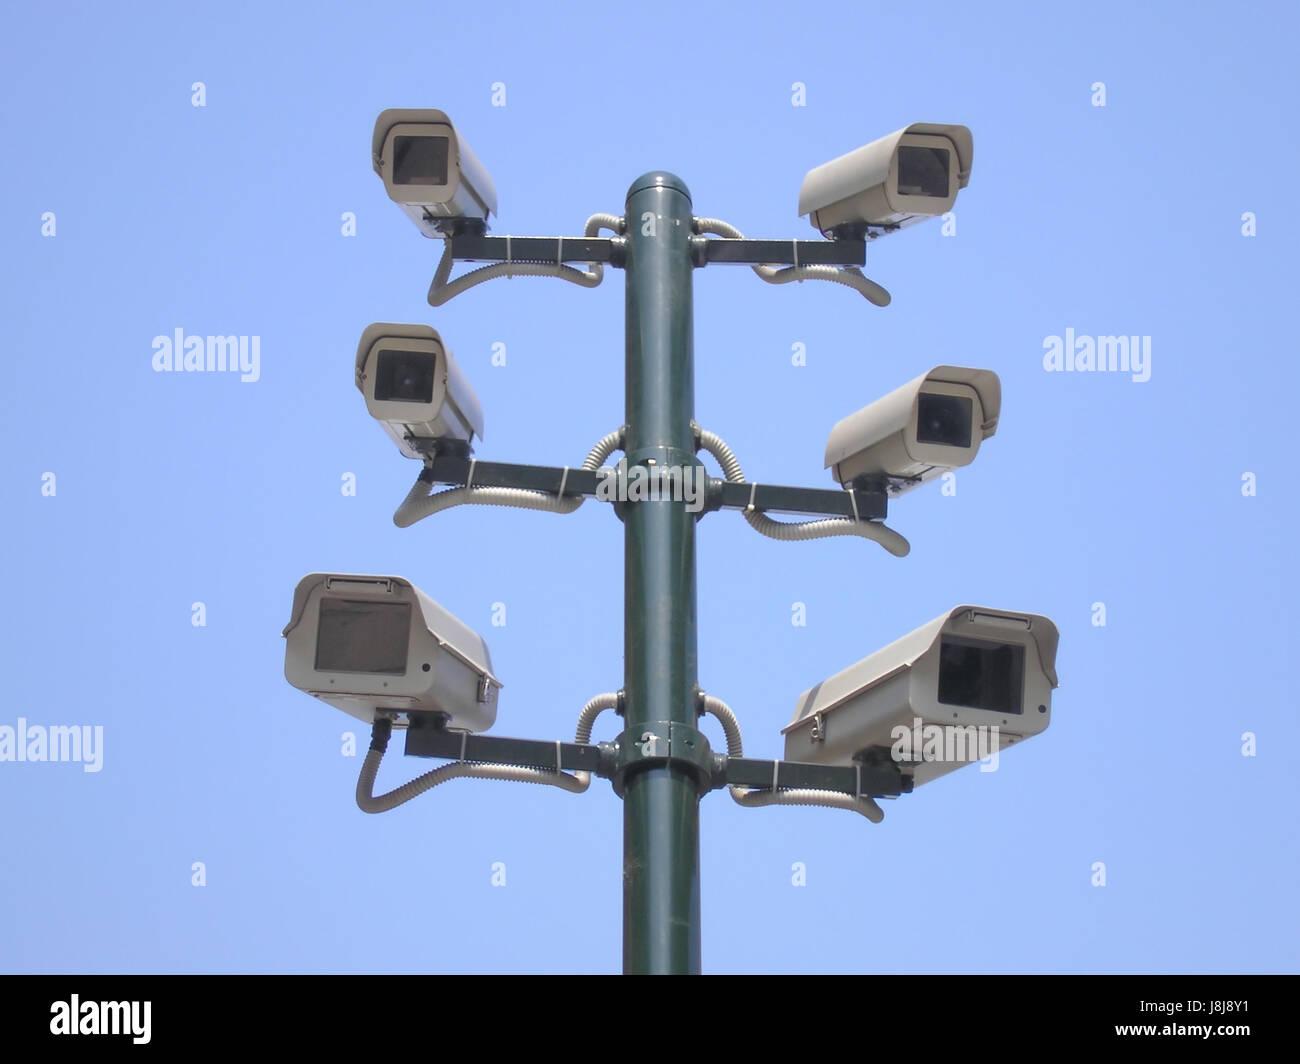 photo, camera, closed, circuit, privacy, cam, burglary, fine, traffic, - Stock Image